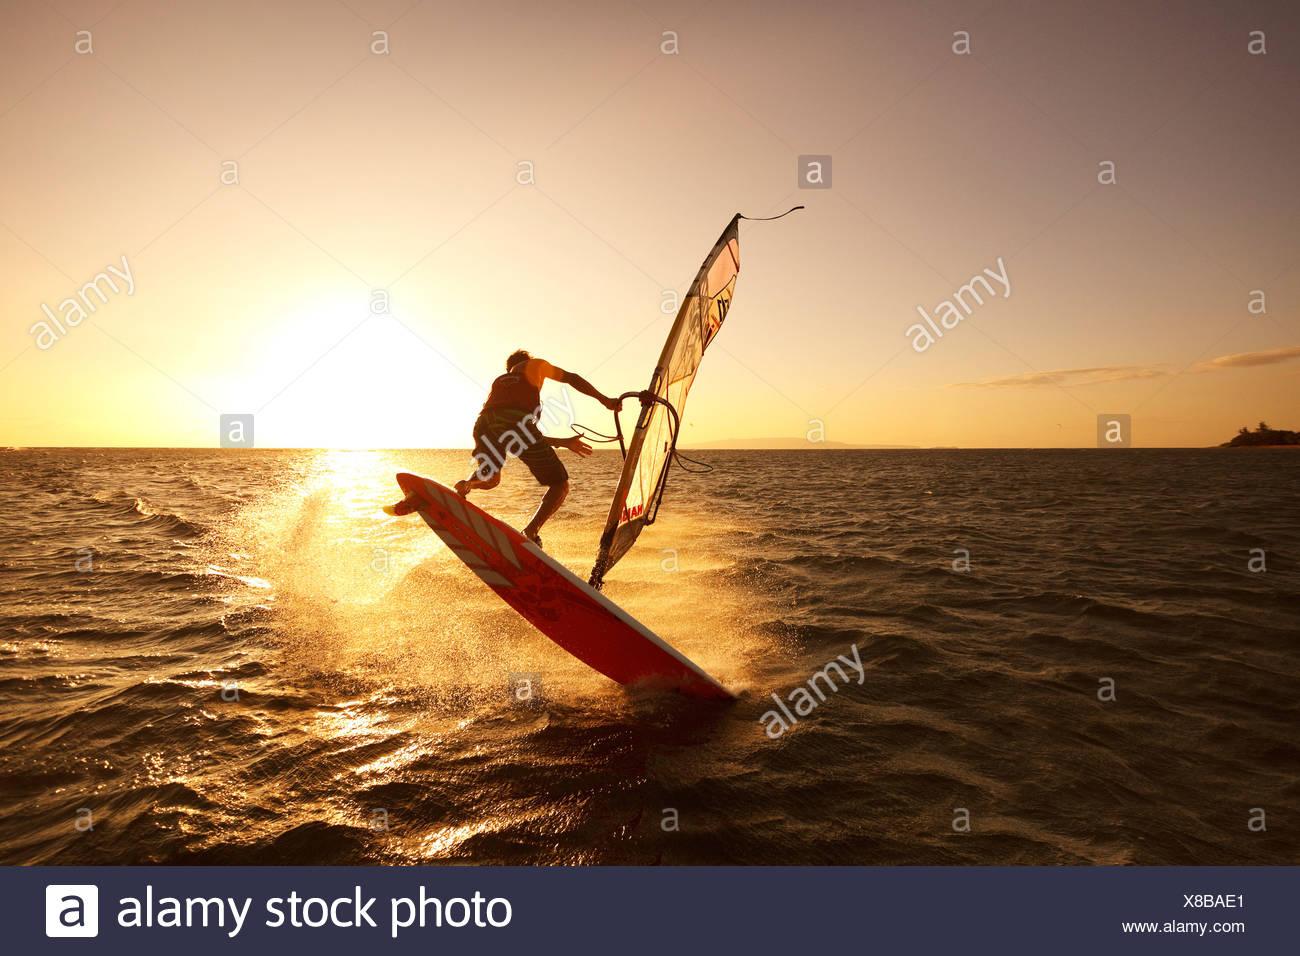 Hawaii, Maui, Kihei, Windsurfer Sailing Off The Coast Of South Maui At Sunset - Stock Image